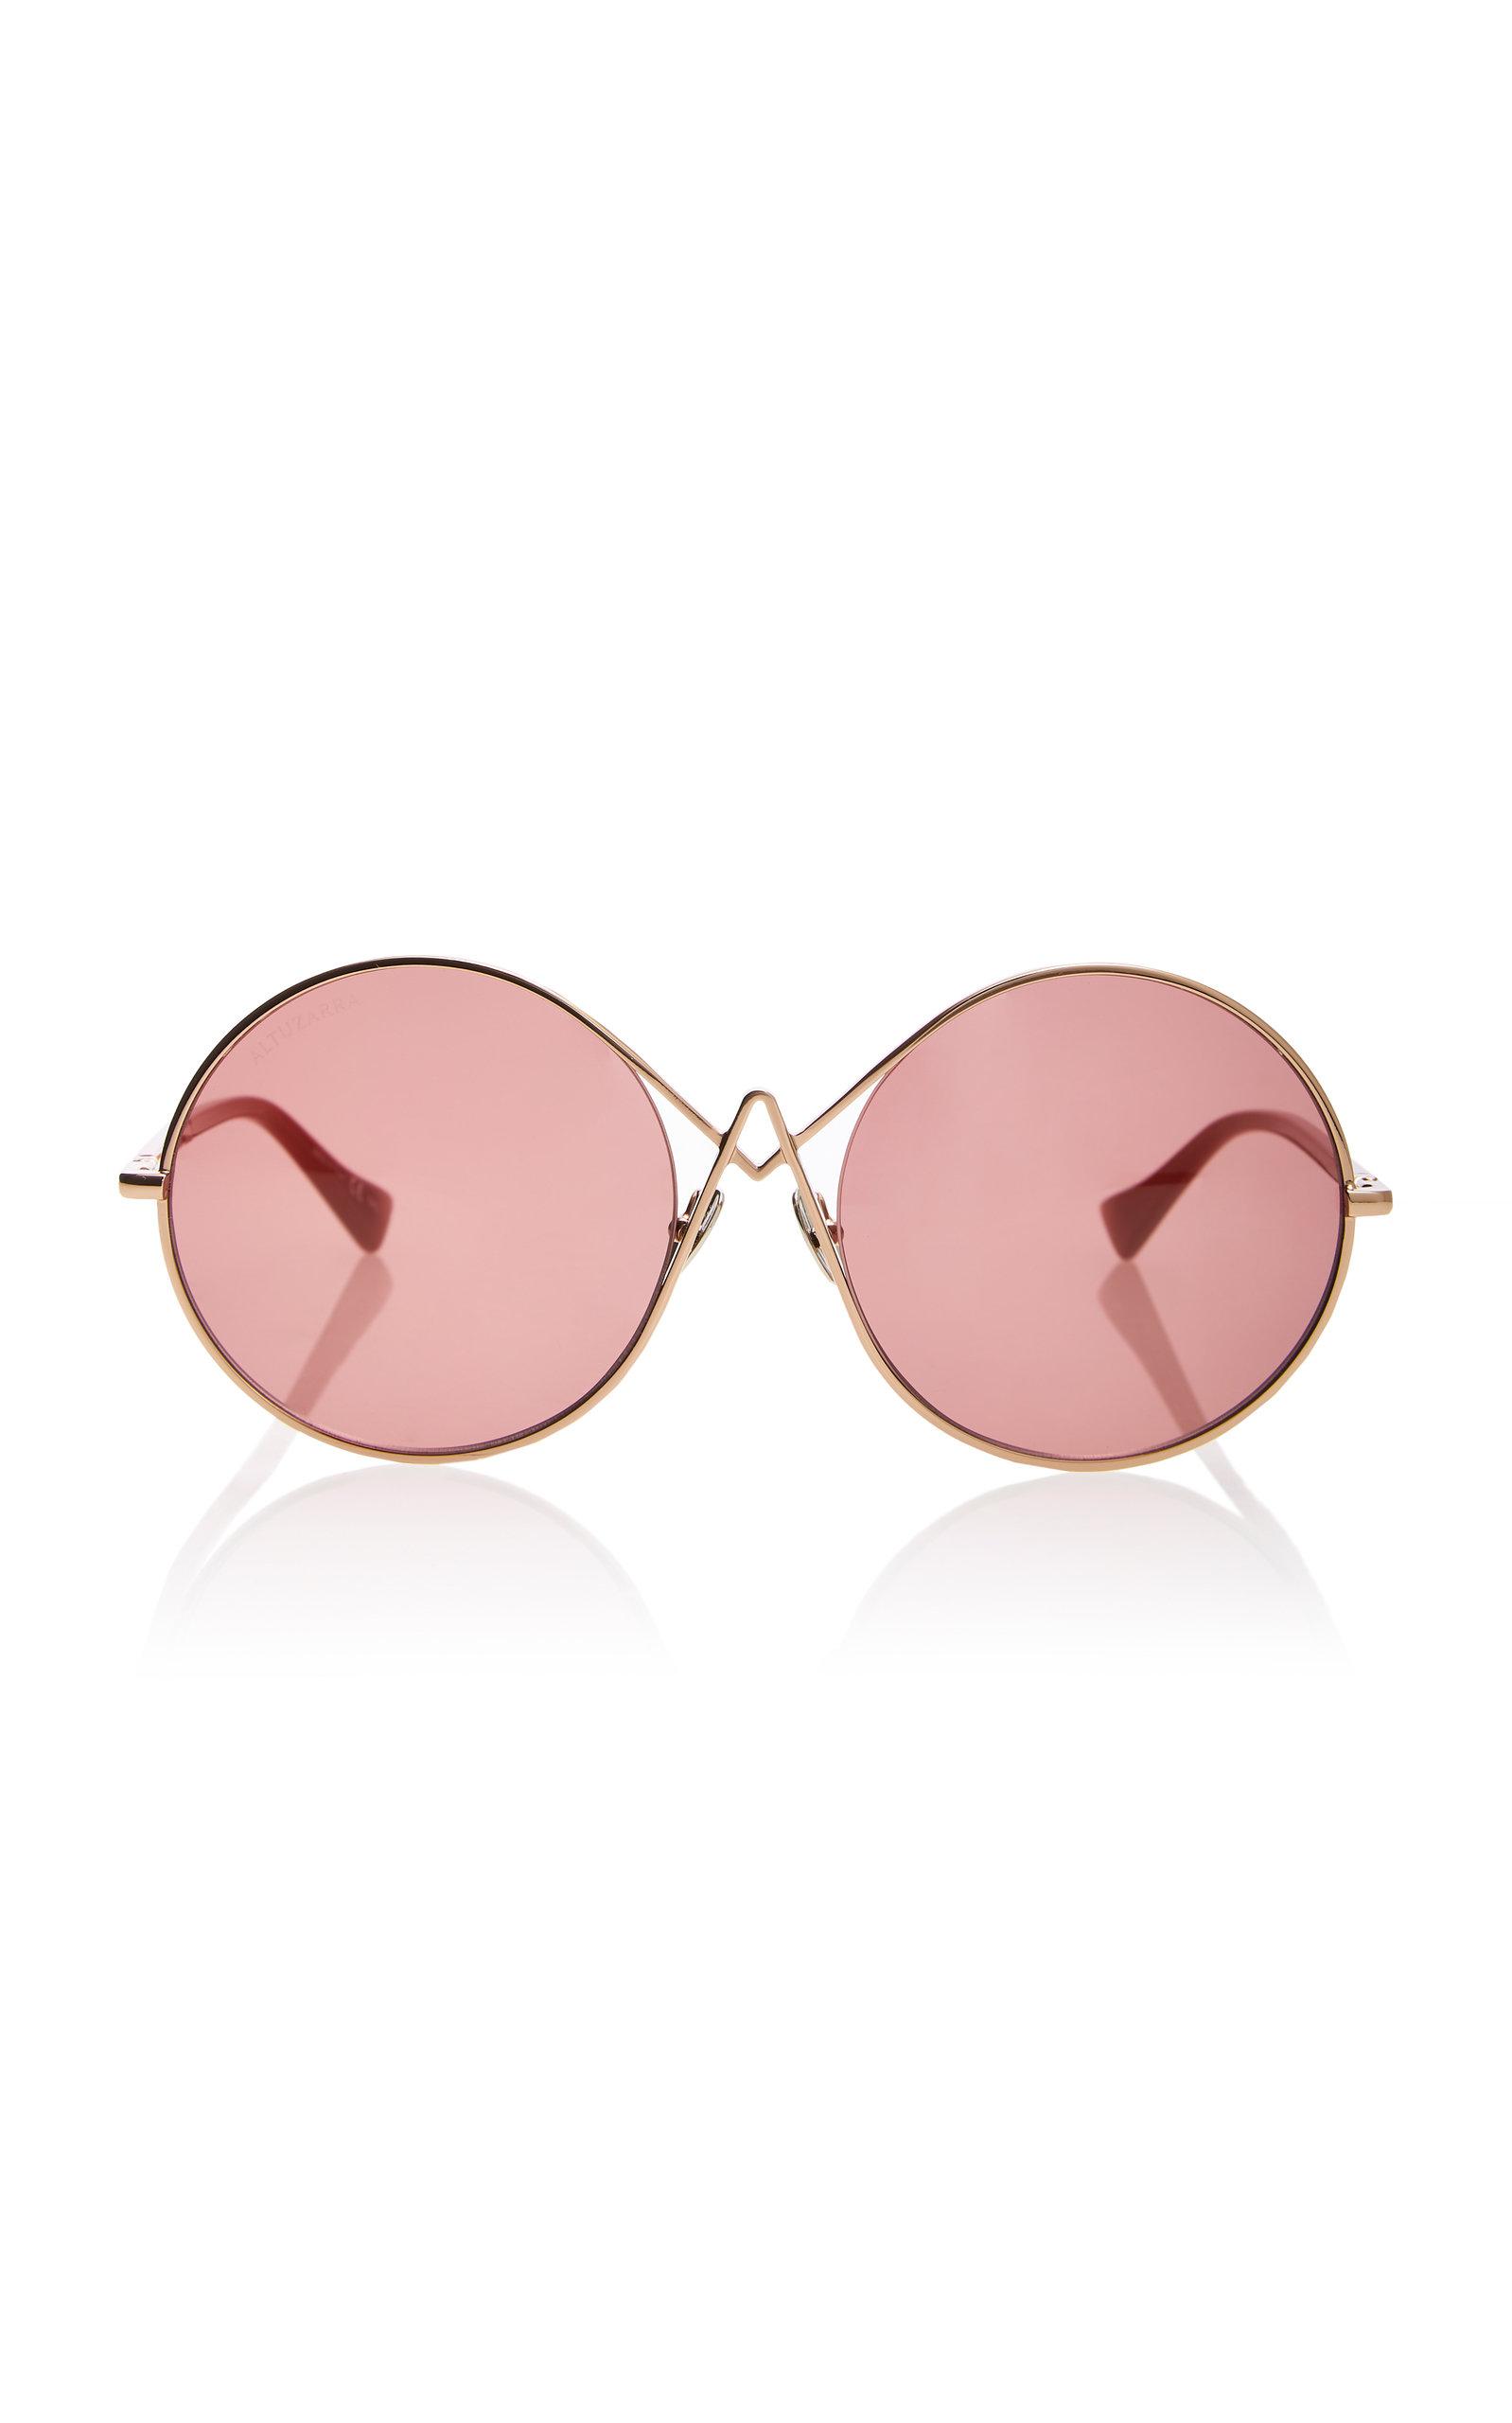 ALTUZARRA SUNGLASSES Oversized Round Sunglasses in Pink